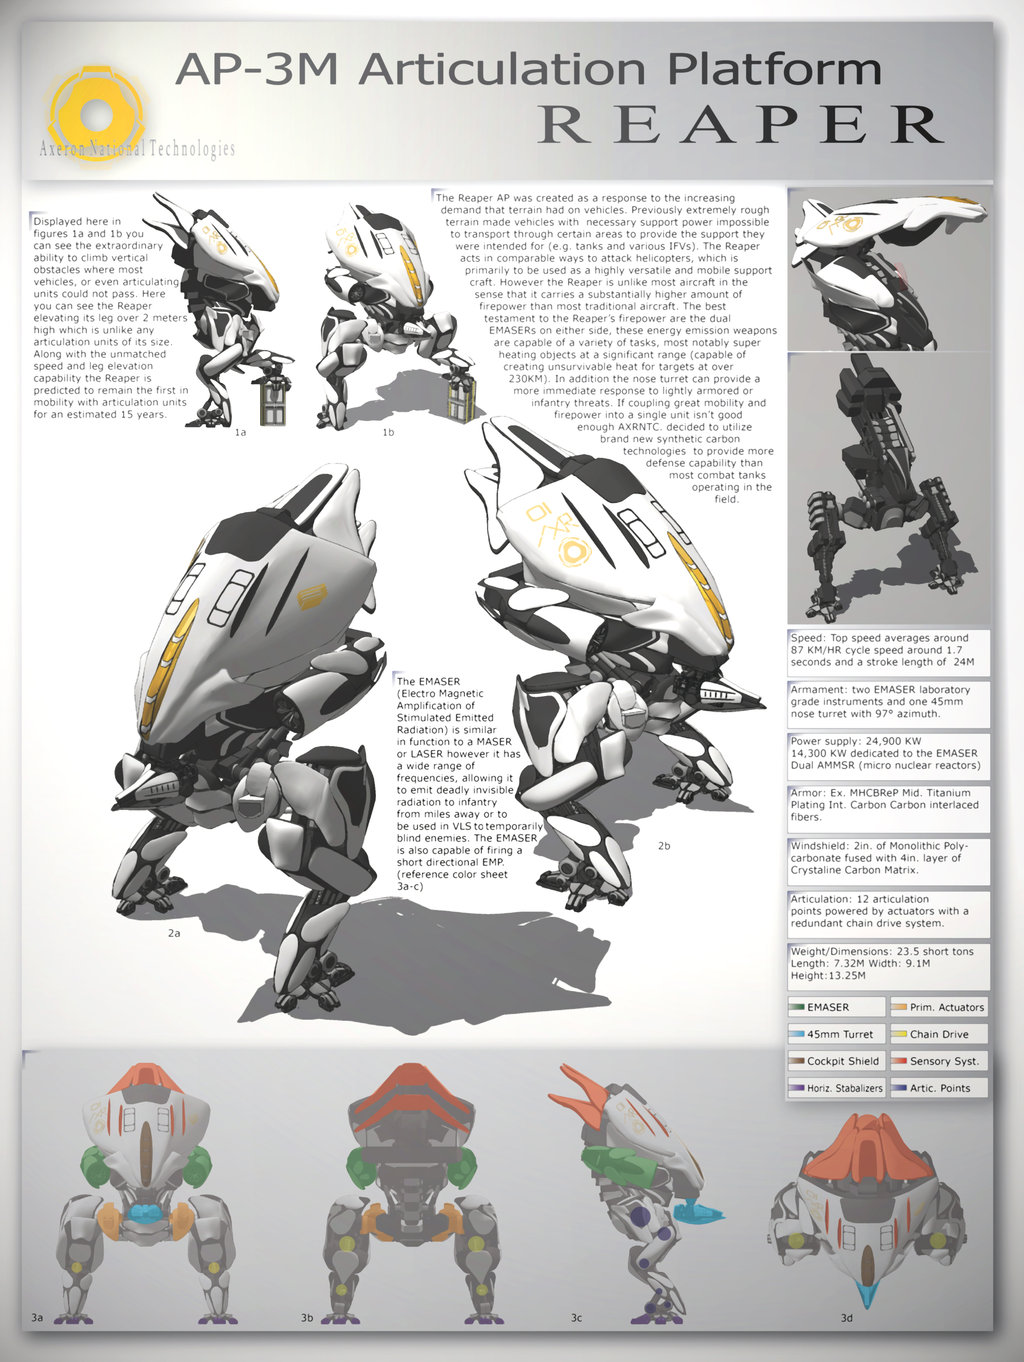 Reaper Articulation Platform by MrJumpManV4